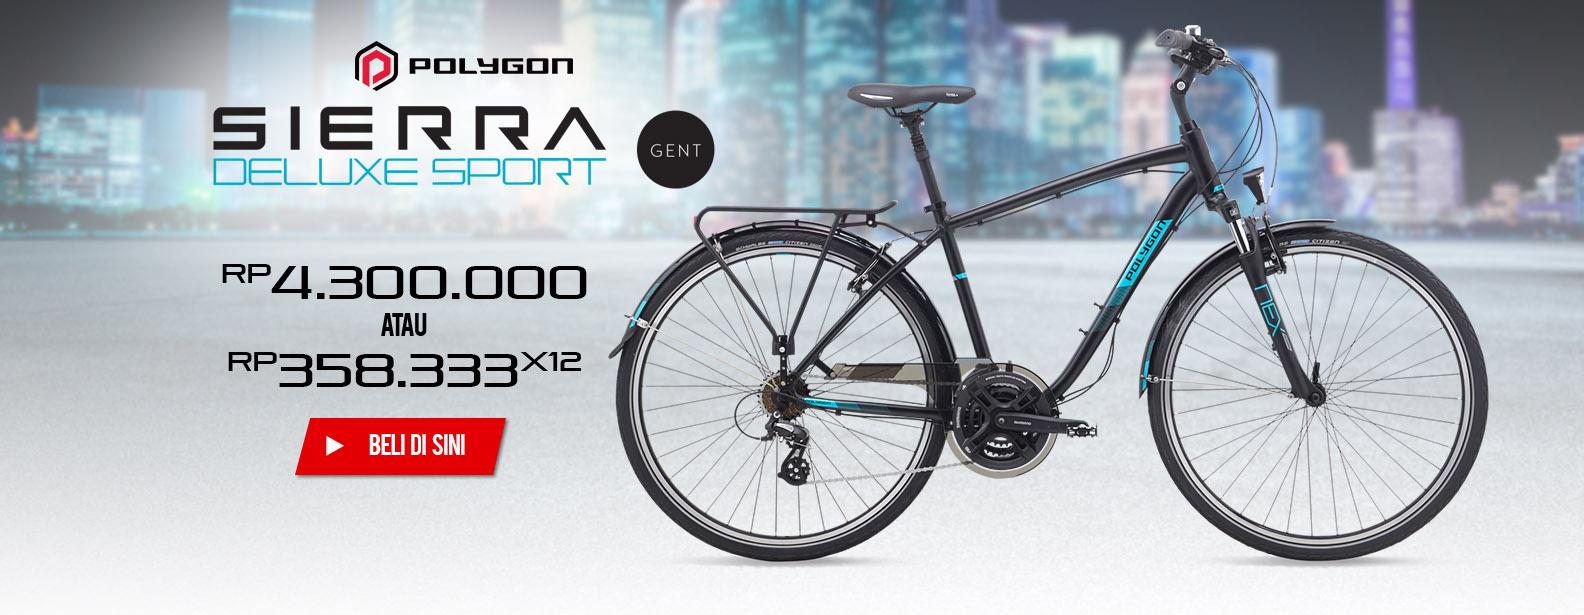 Polygon Sepeda Sierra Deluxe Sport Gent